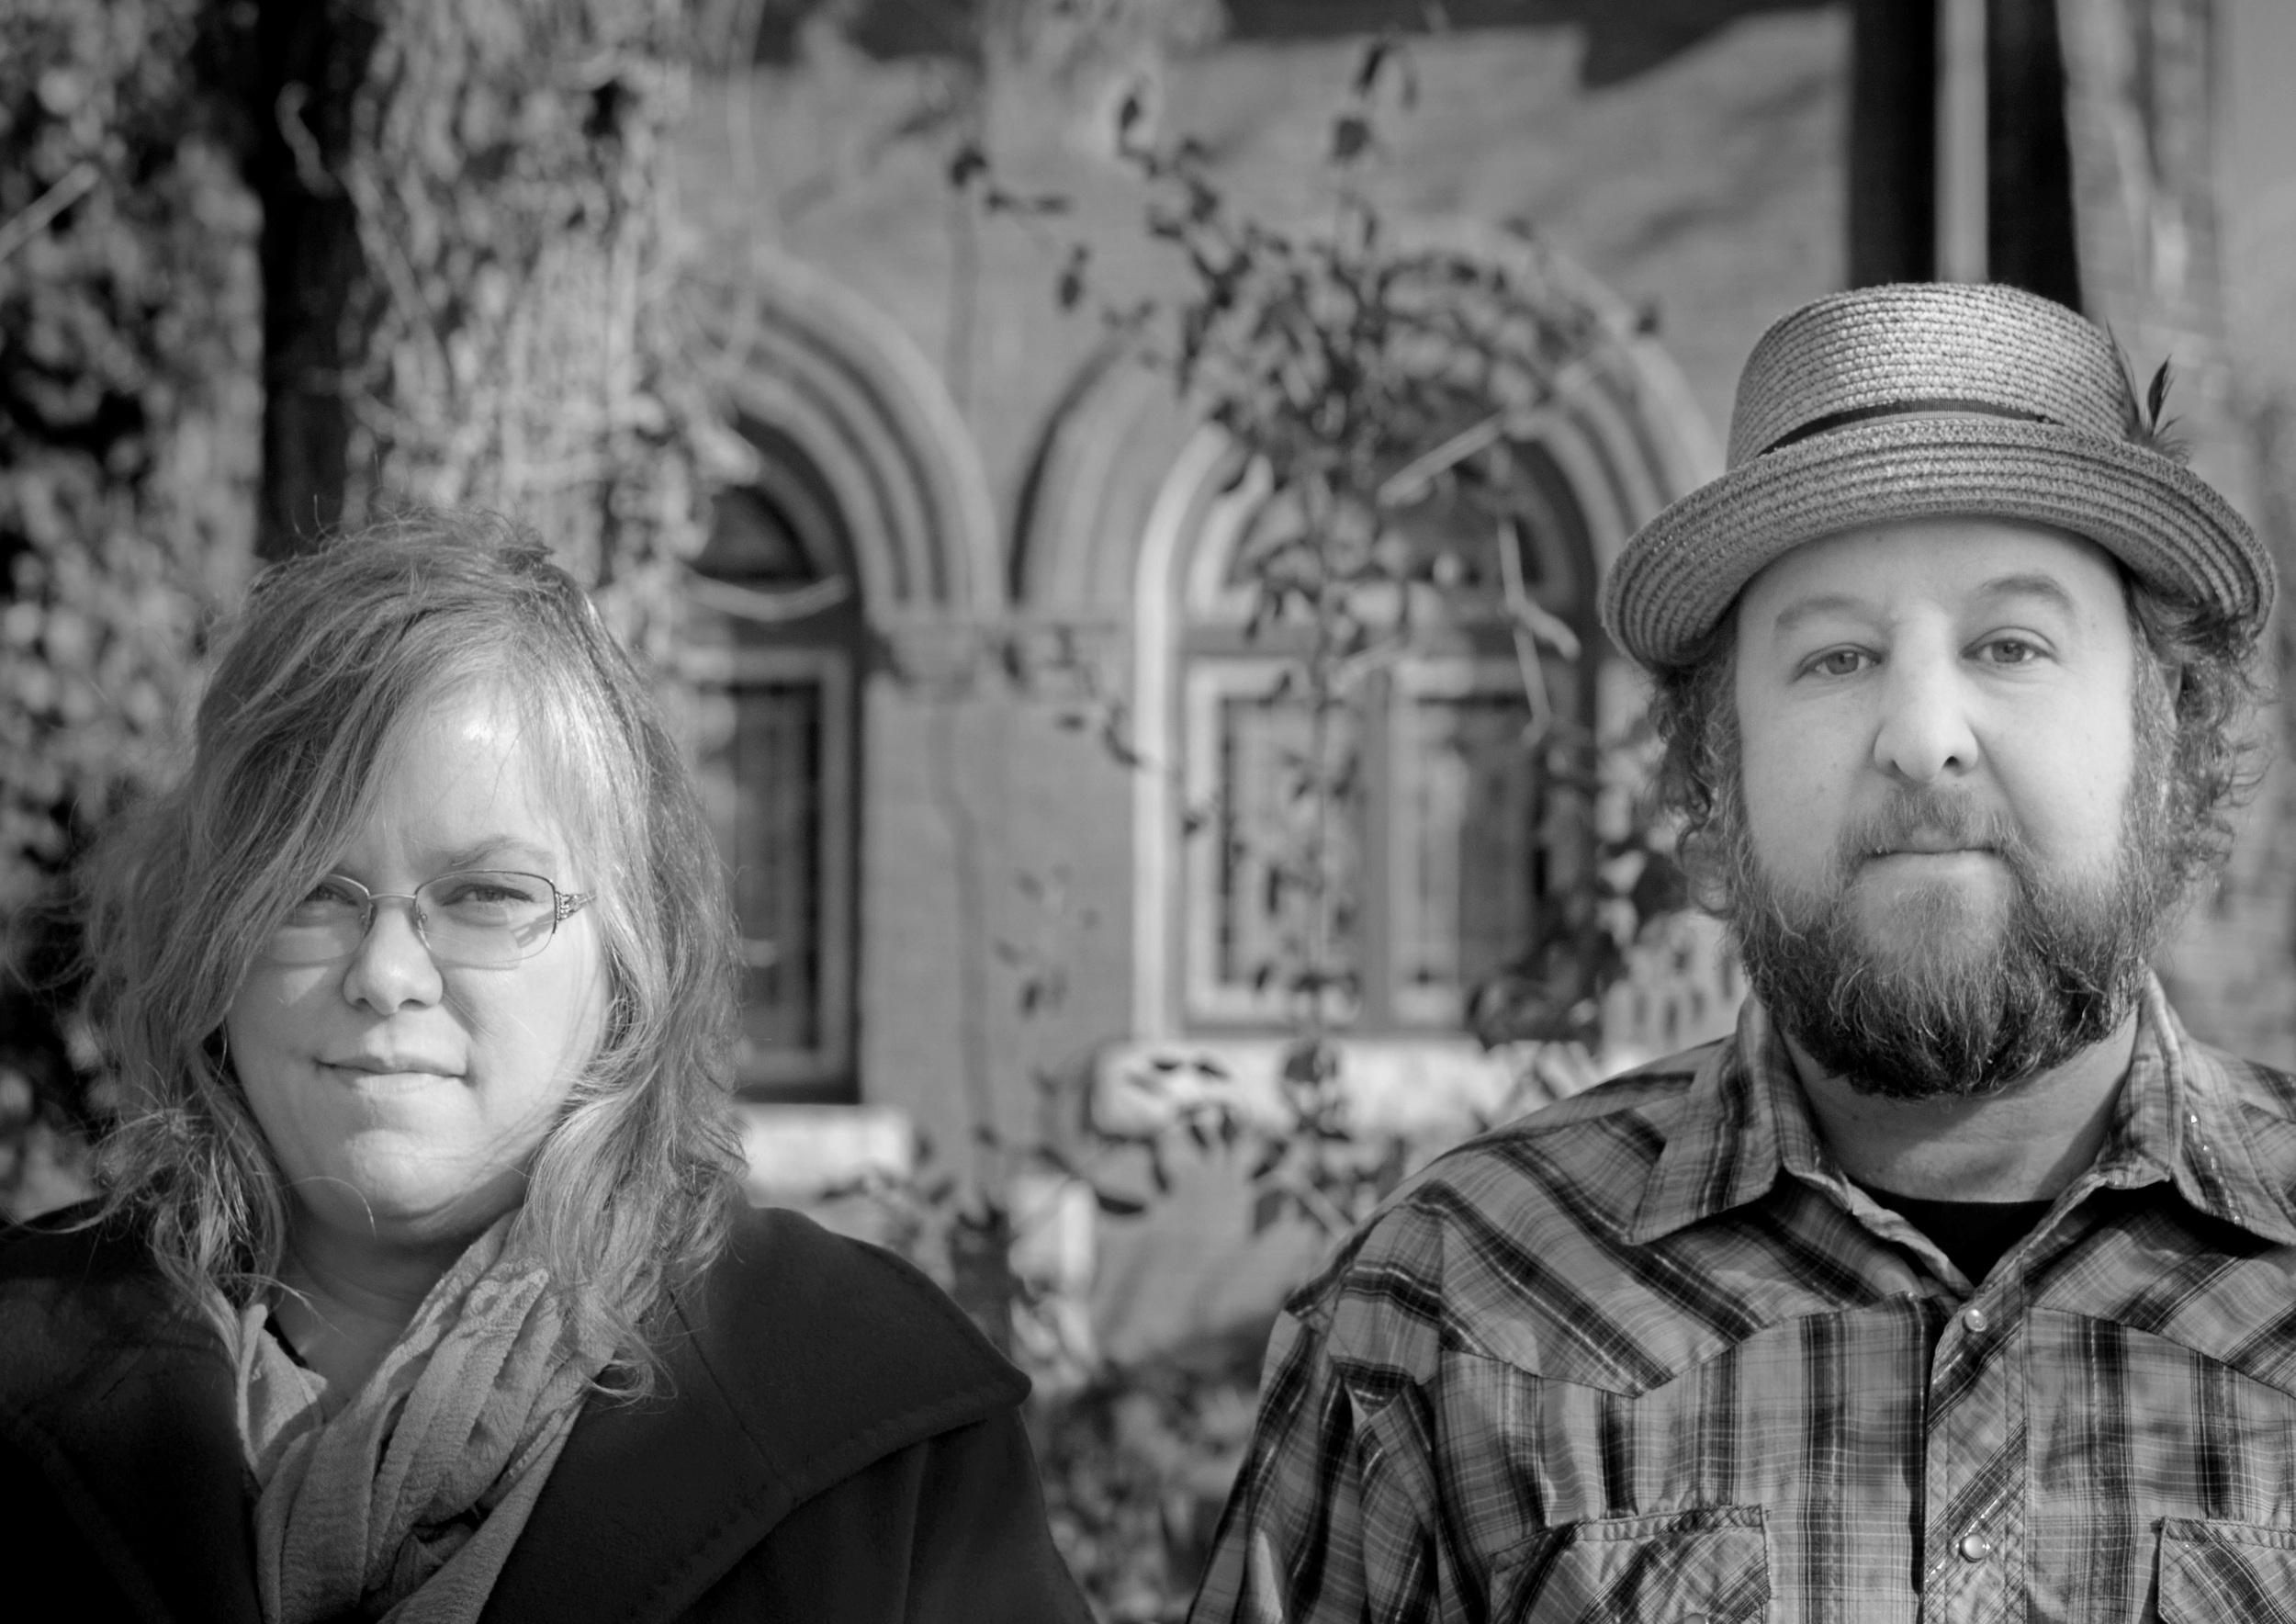 Betse & Clarke building promotional photograph, B/W. Photo credit: Clarke Wyatt